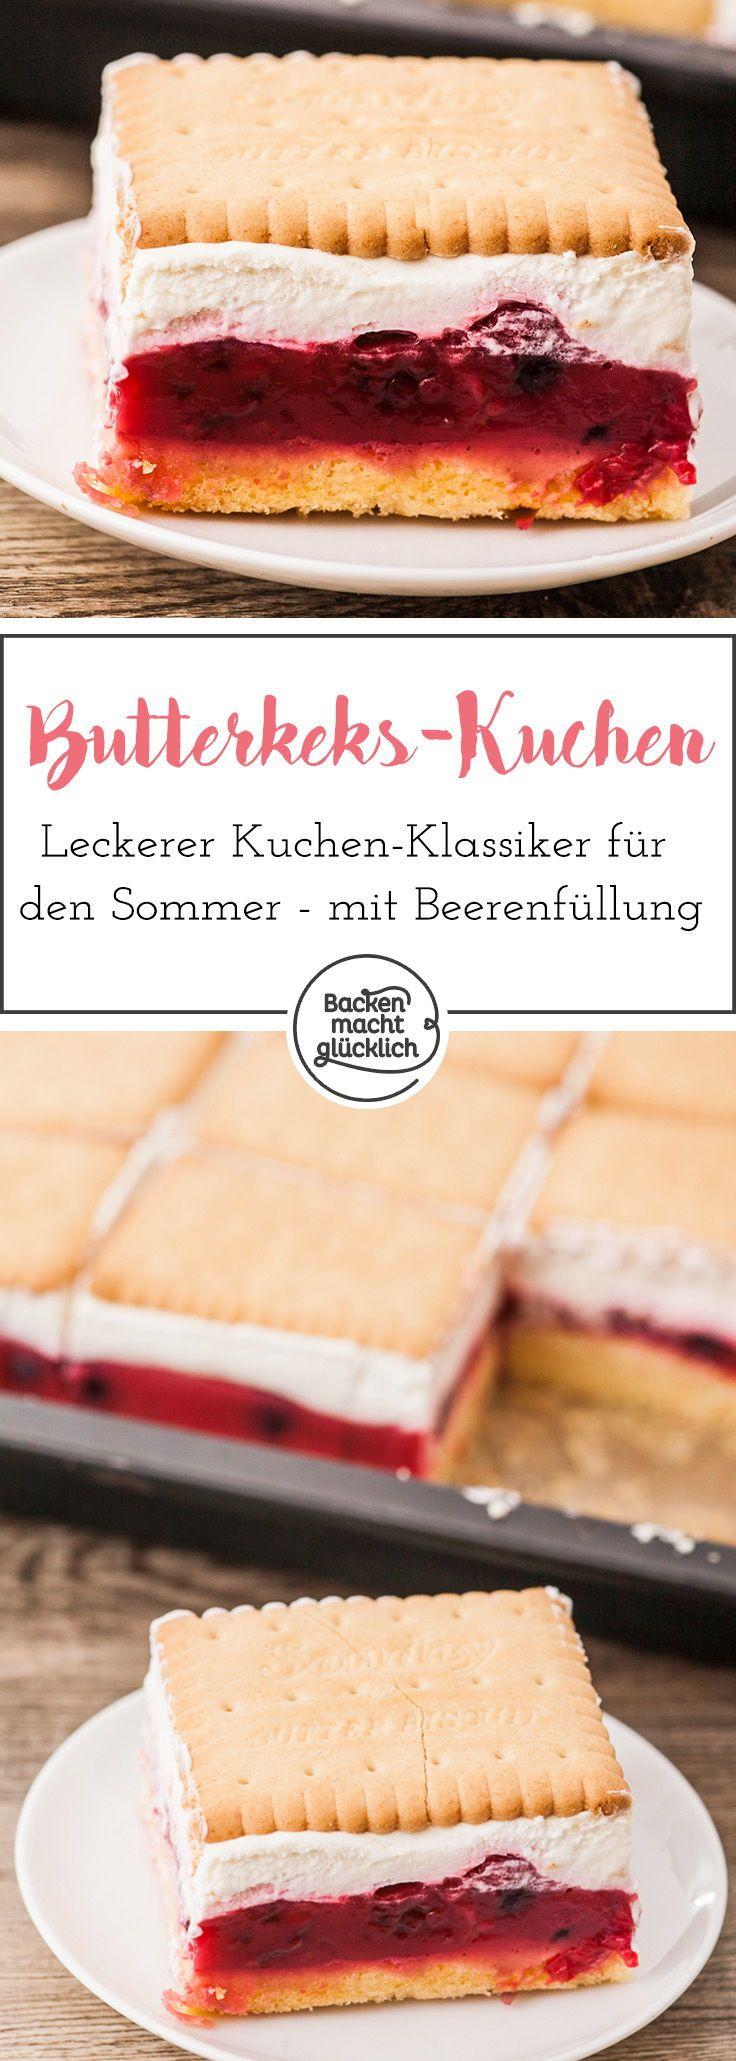 Biscuit au beurre et baies   – Sommer Backrezepte